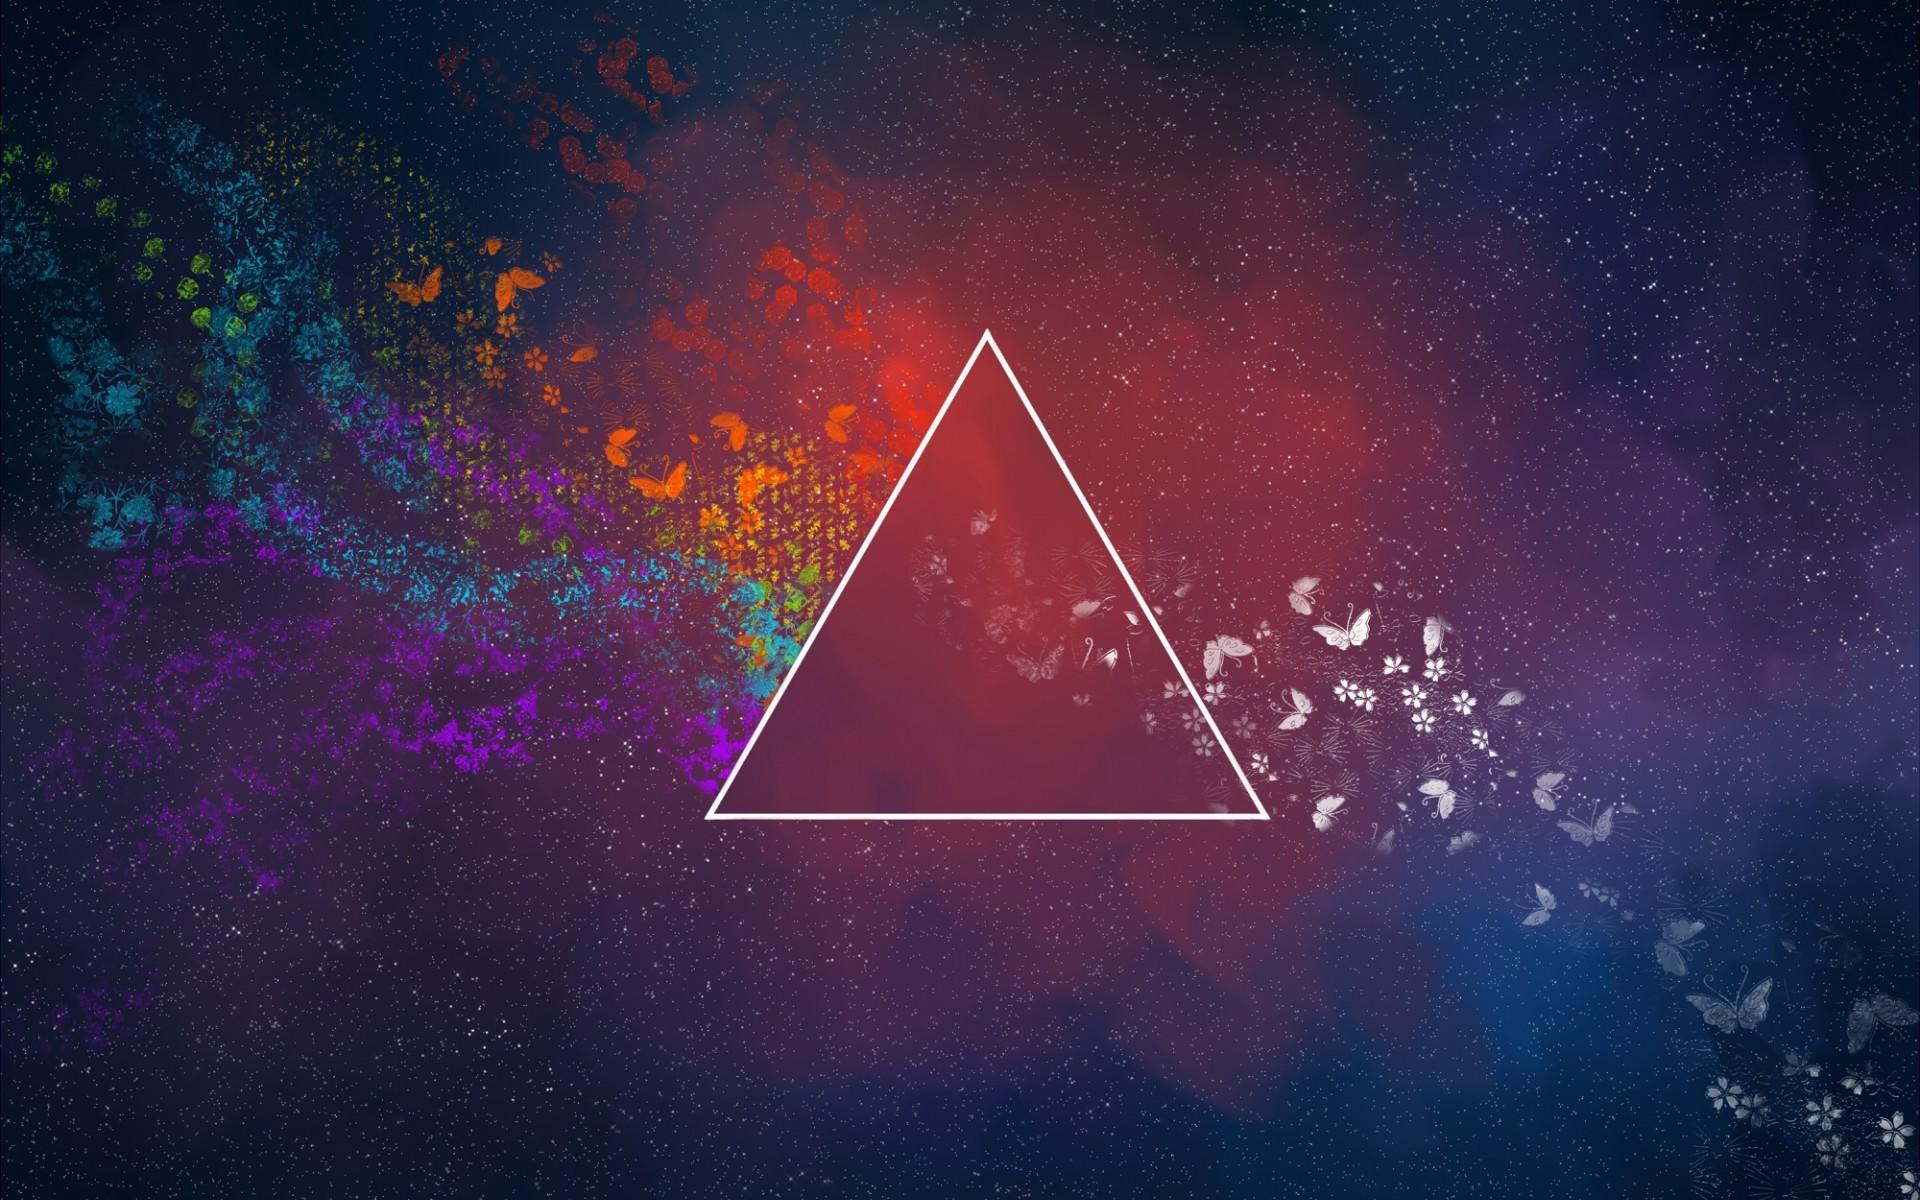 Wallpaper : colorful, abstract, galaxy, minimalism, sky ...